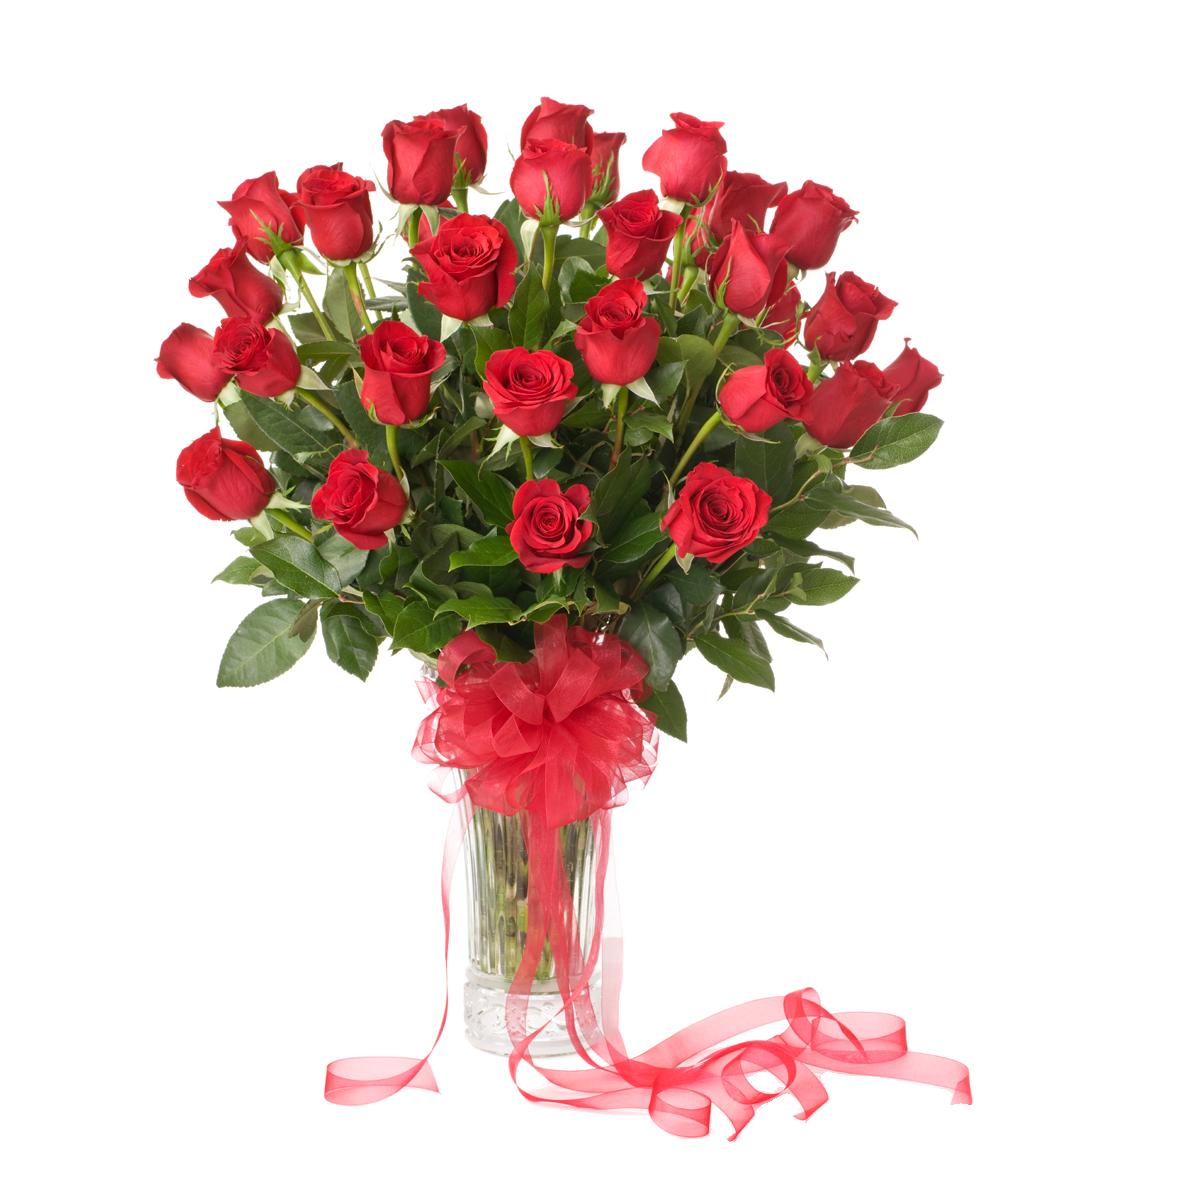 50 Red Roses Arranged in Vase.